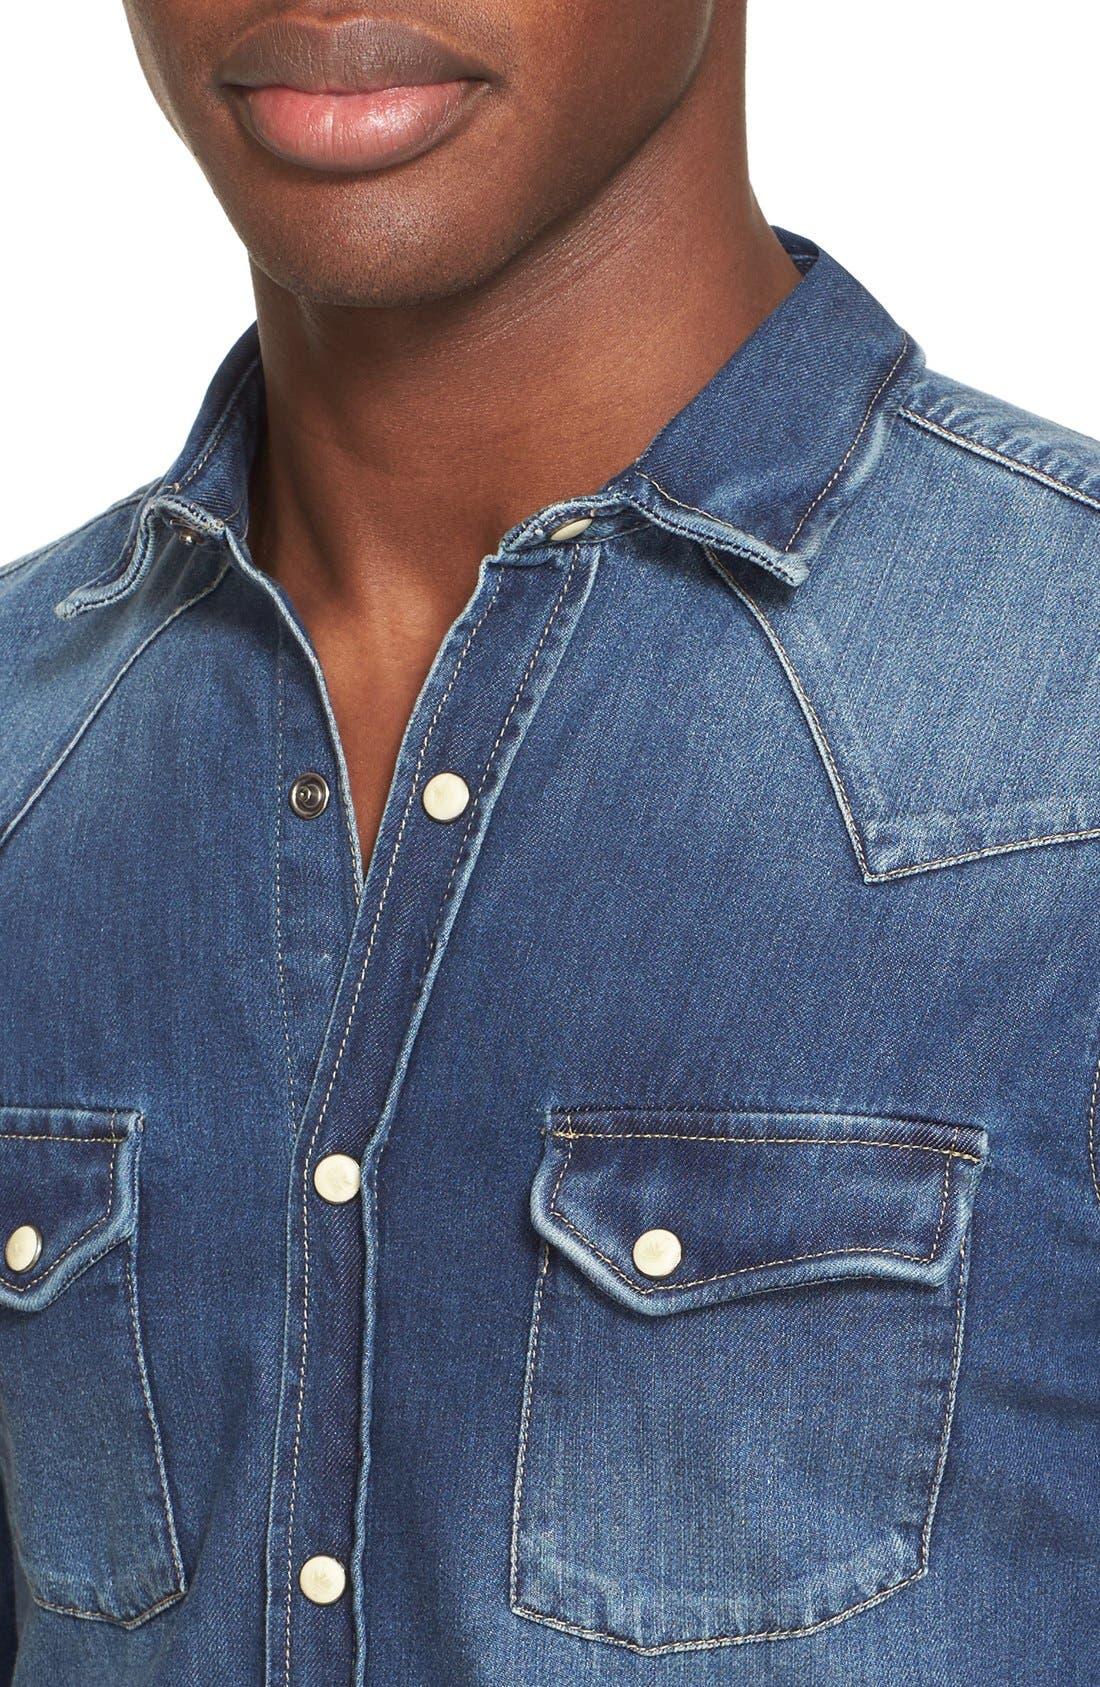 Trim Fit Washed Denim Western Shirt,                             Alternate thumbnail 2, color,                             Blue